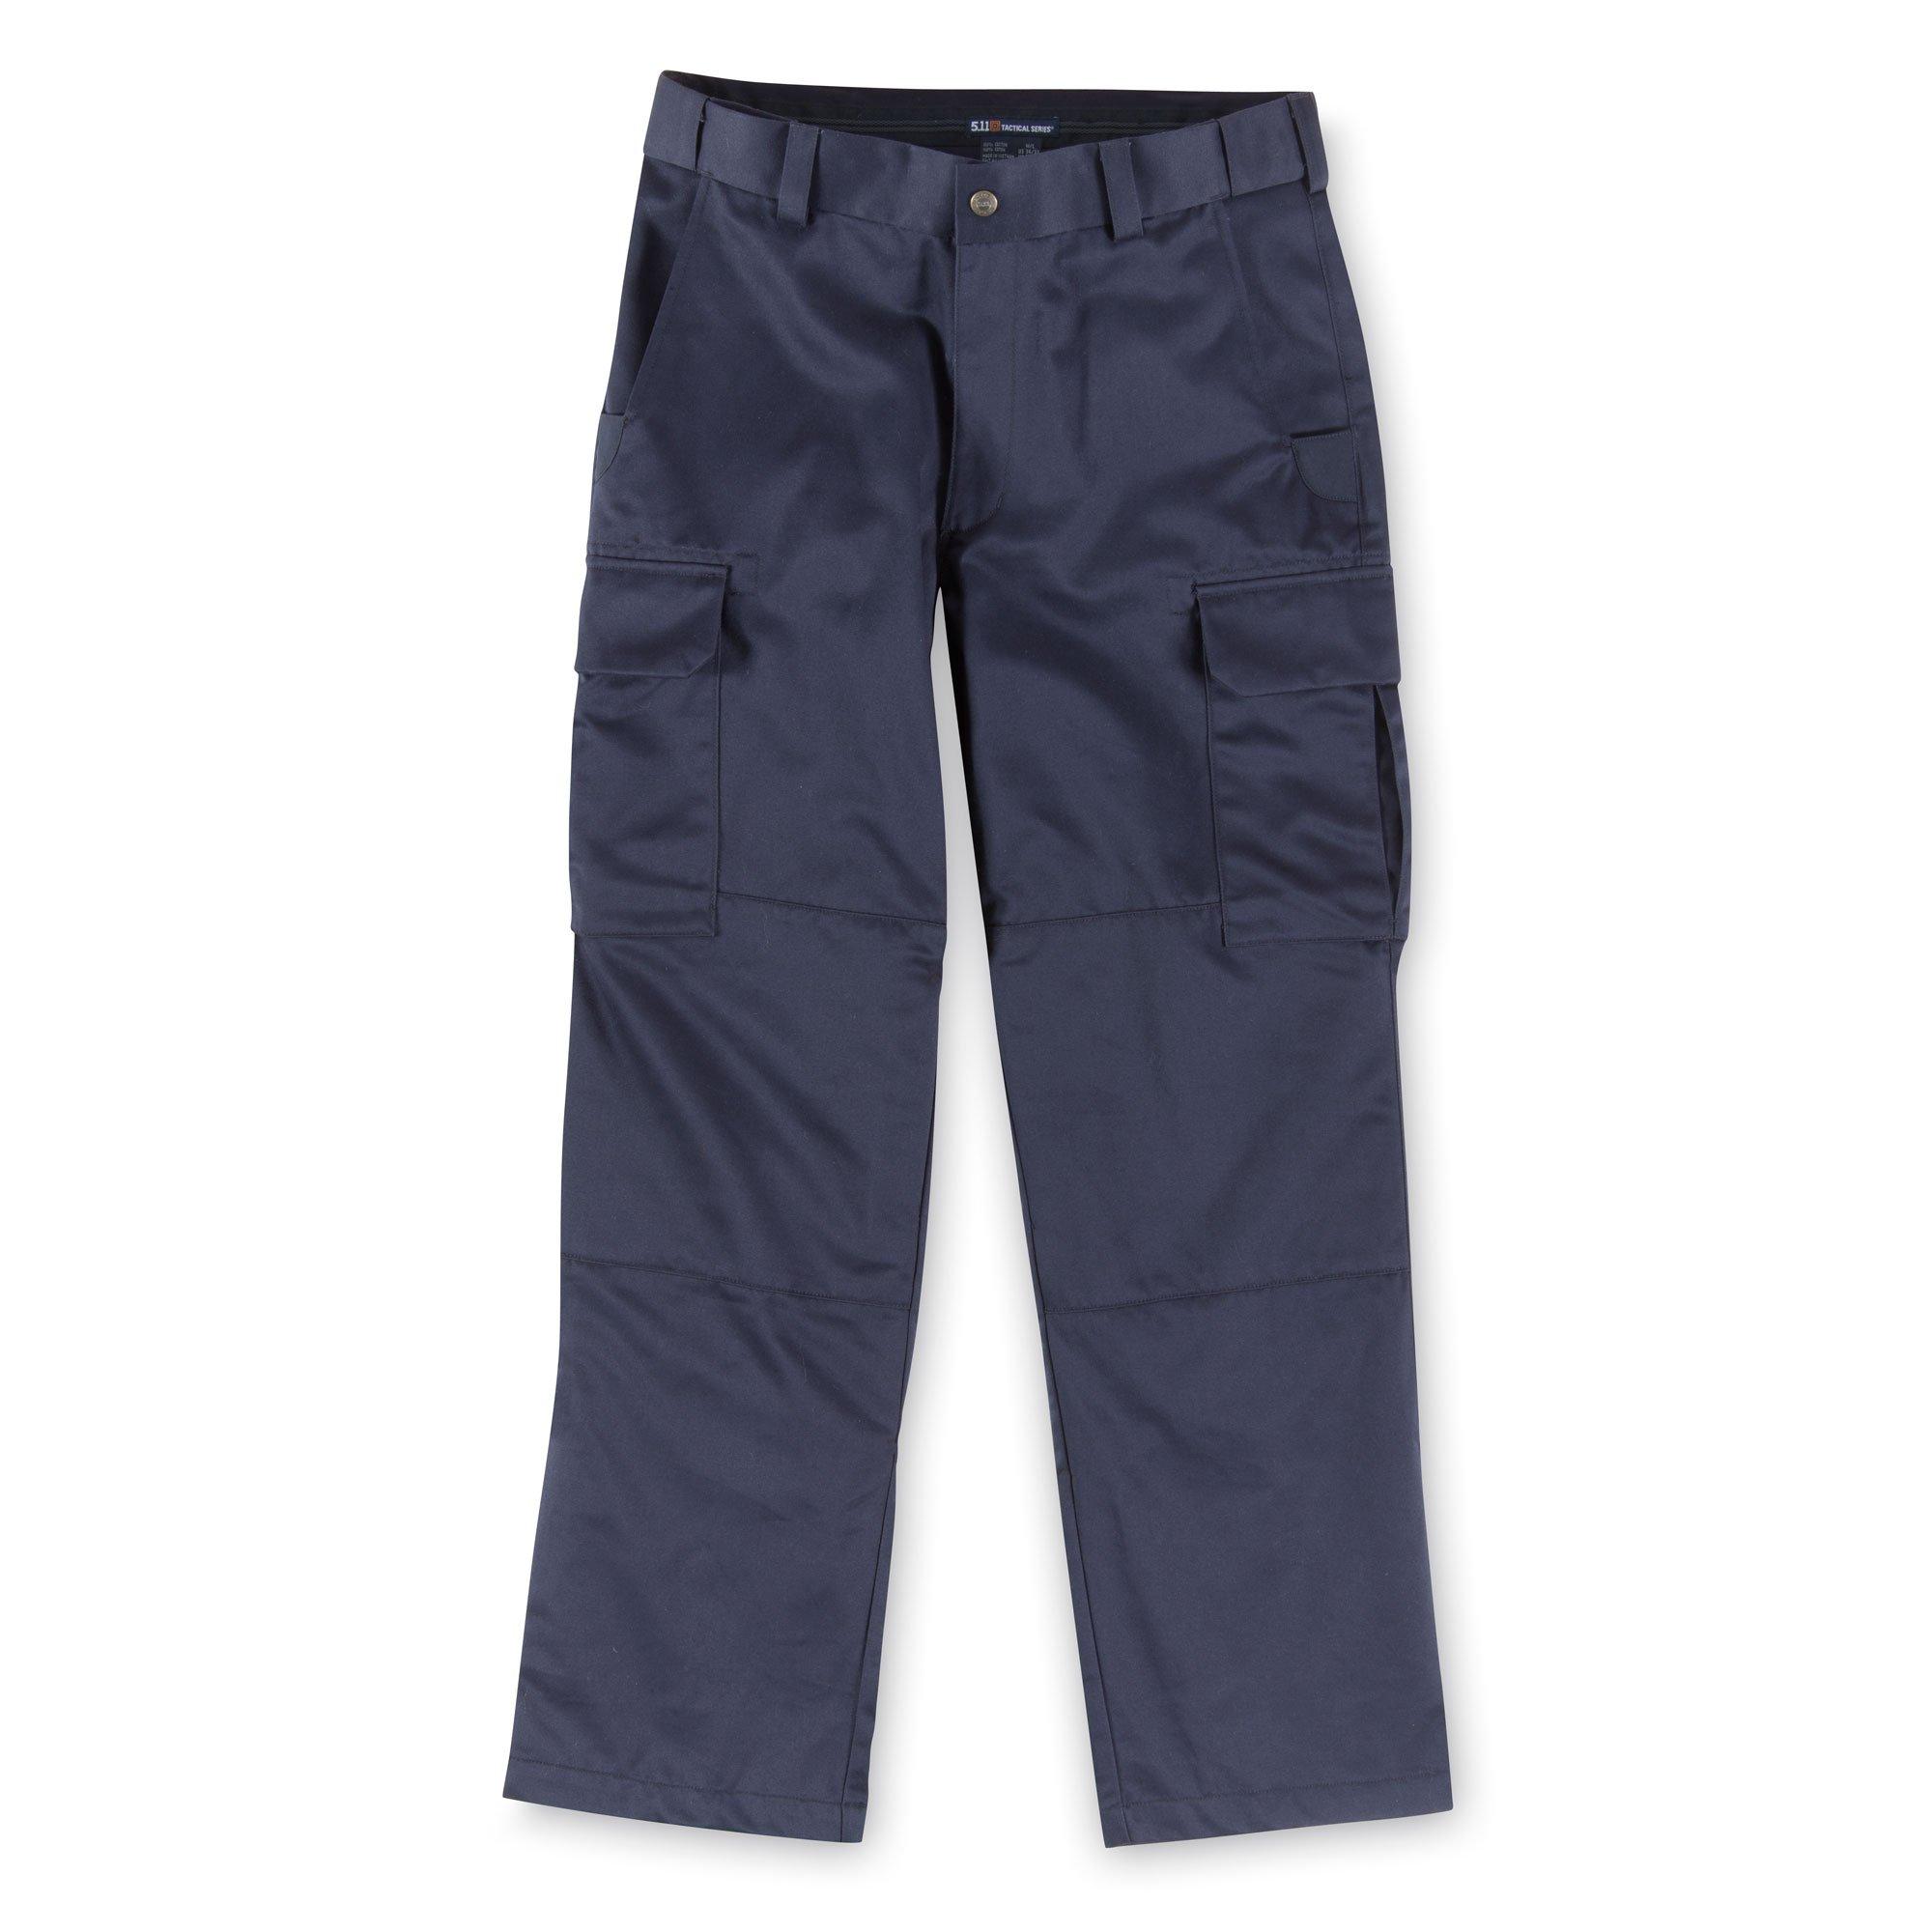 5.11 Men's Company Cargo Pant, Fire Navy, 34 x 30-Inch